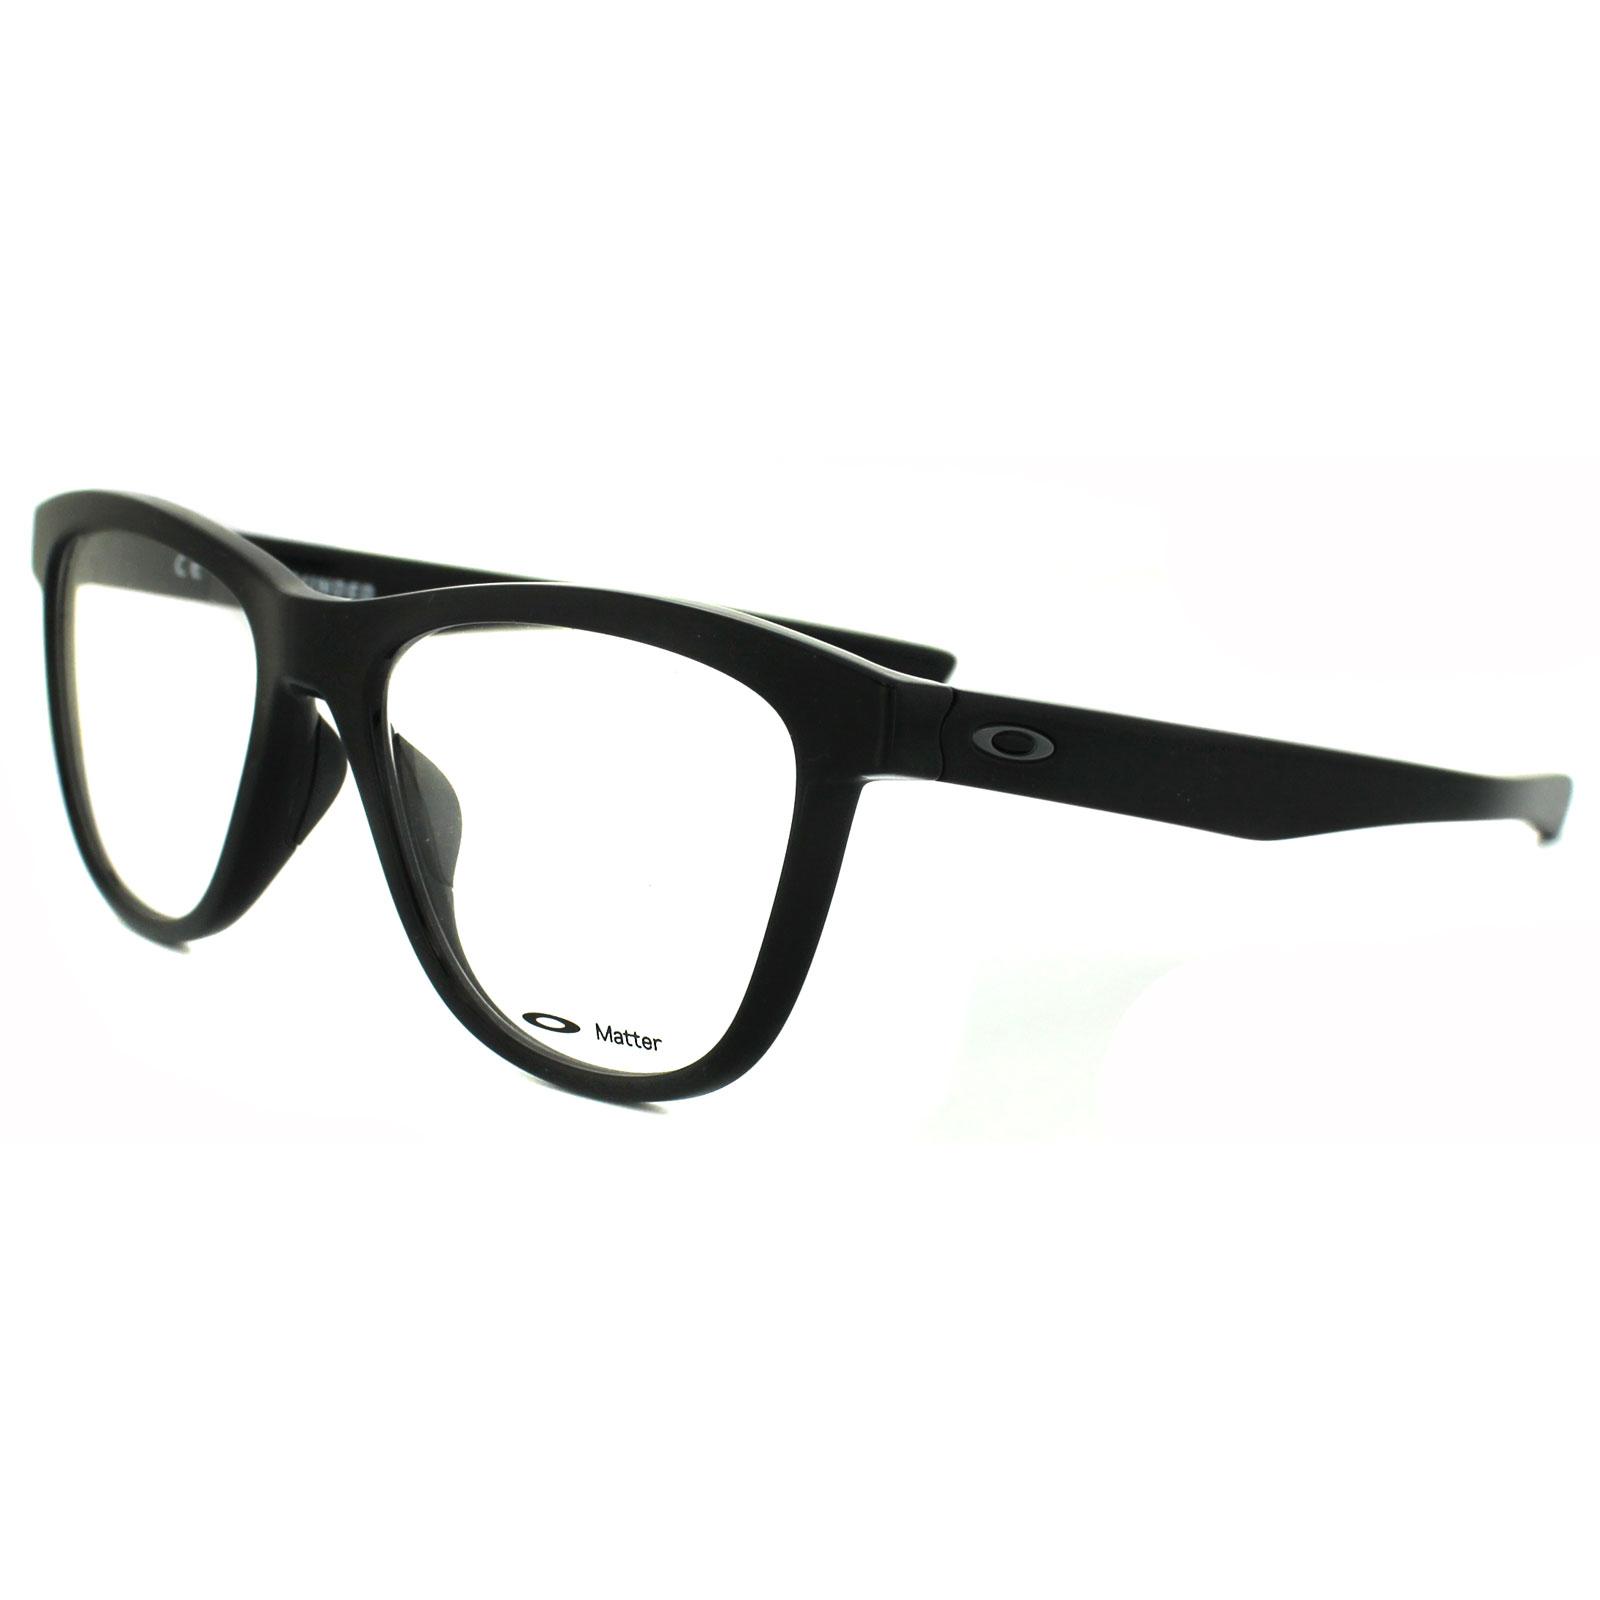 94ae30180e Oakley Glasses Frames Grounded OX8070-01 Polished Black 888392124753 ...